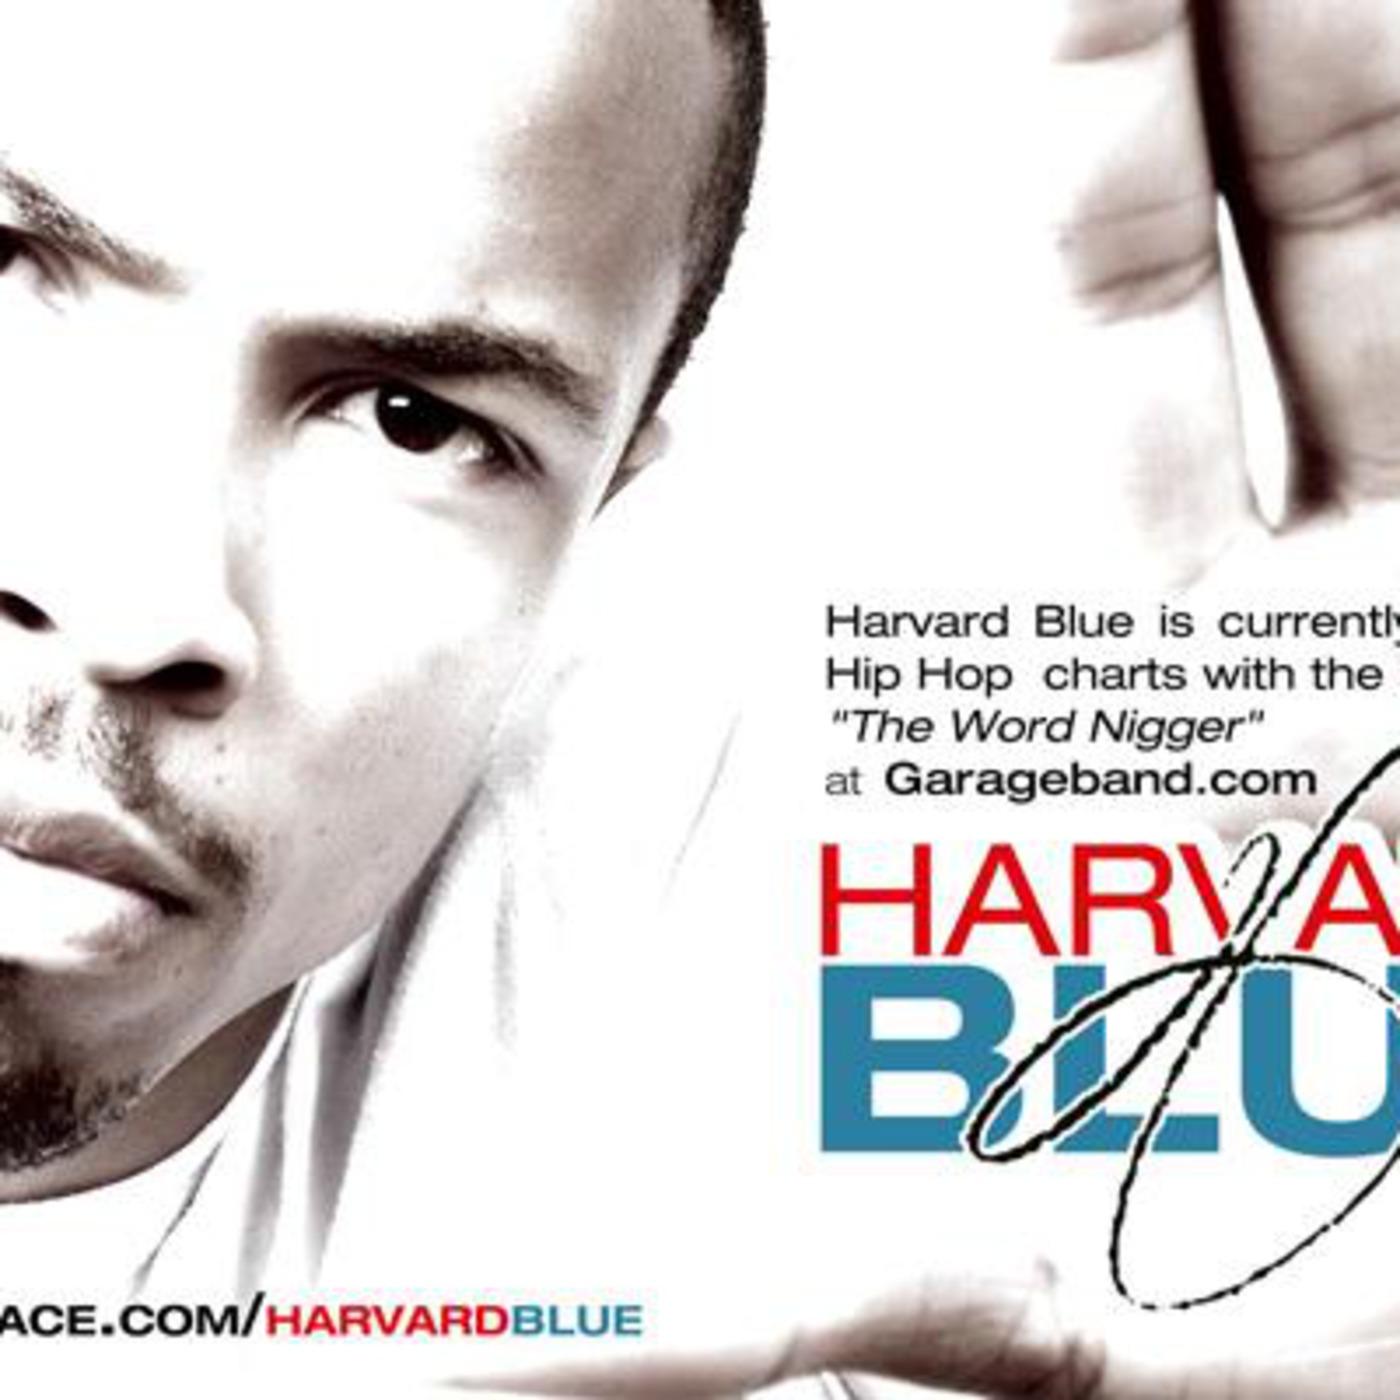 Harvard Blue